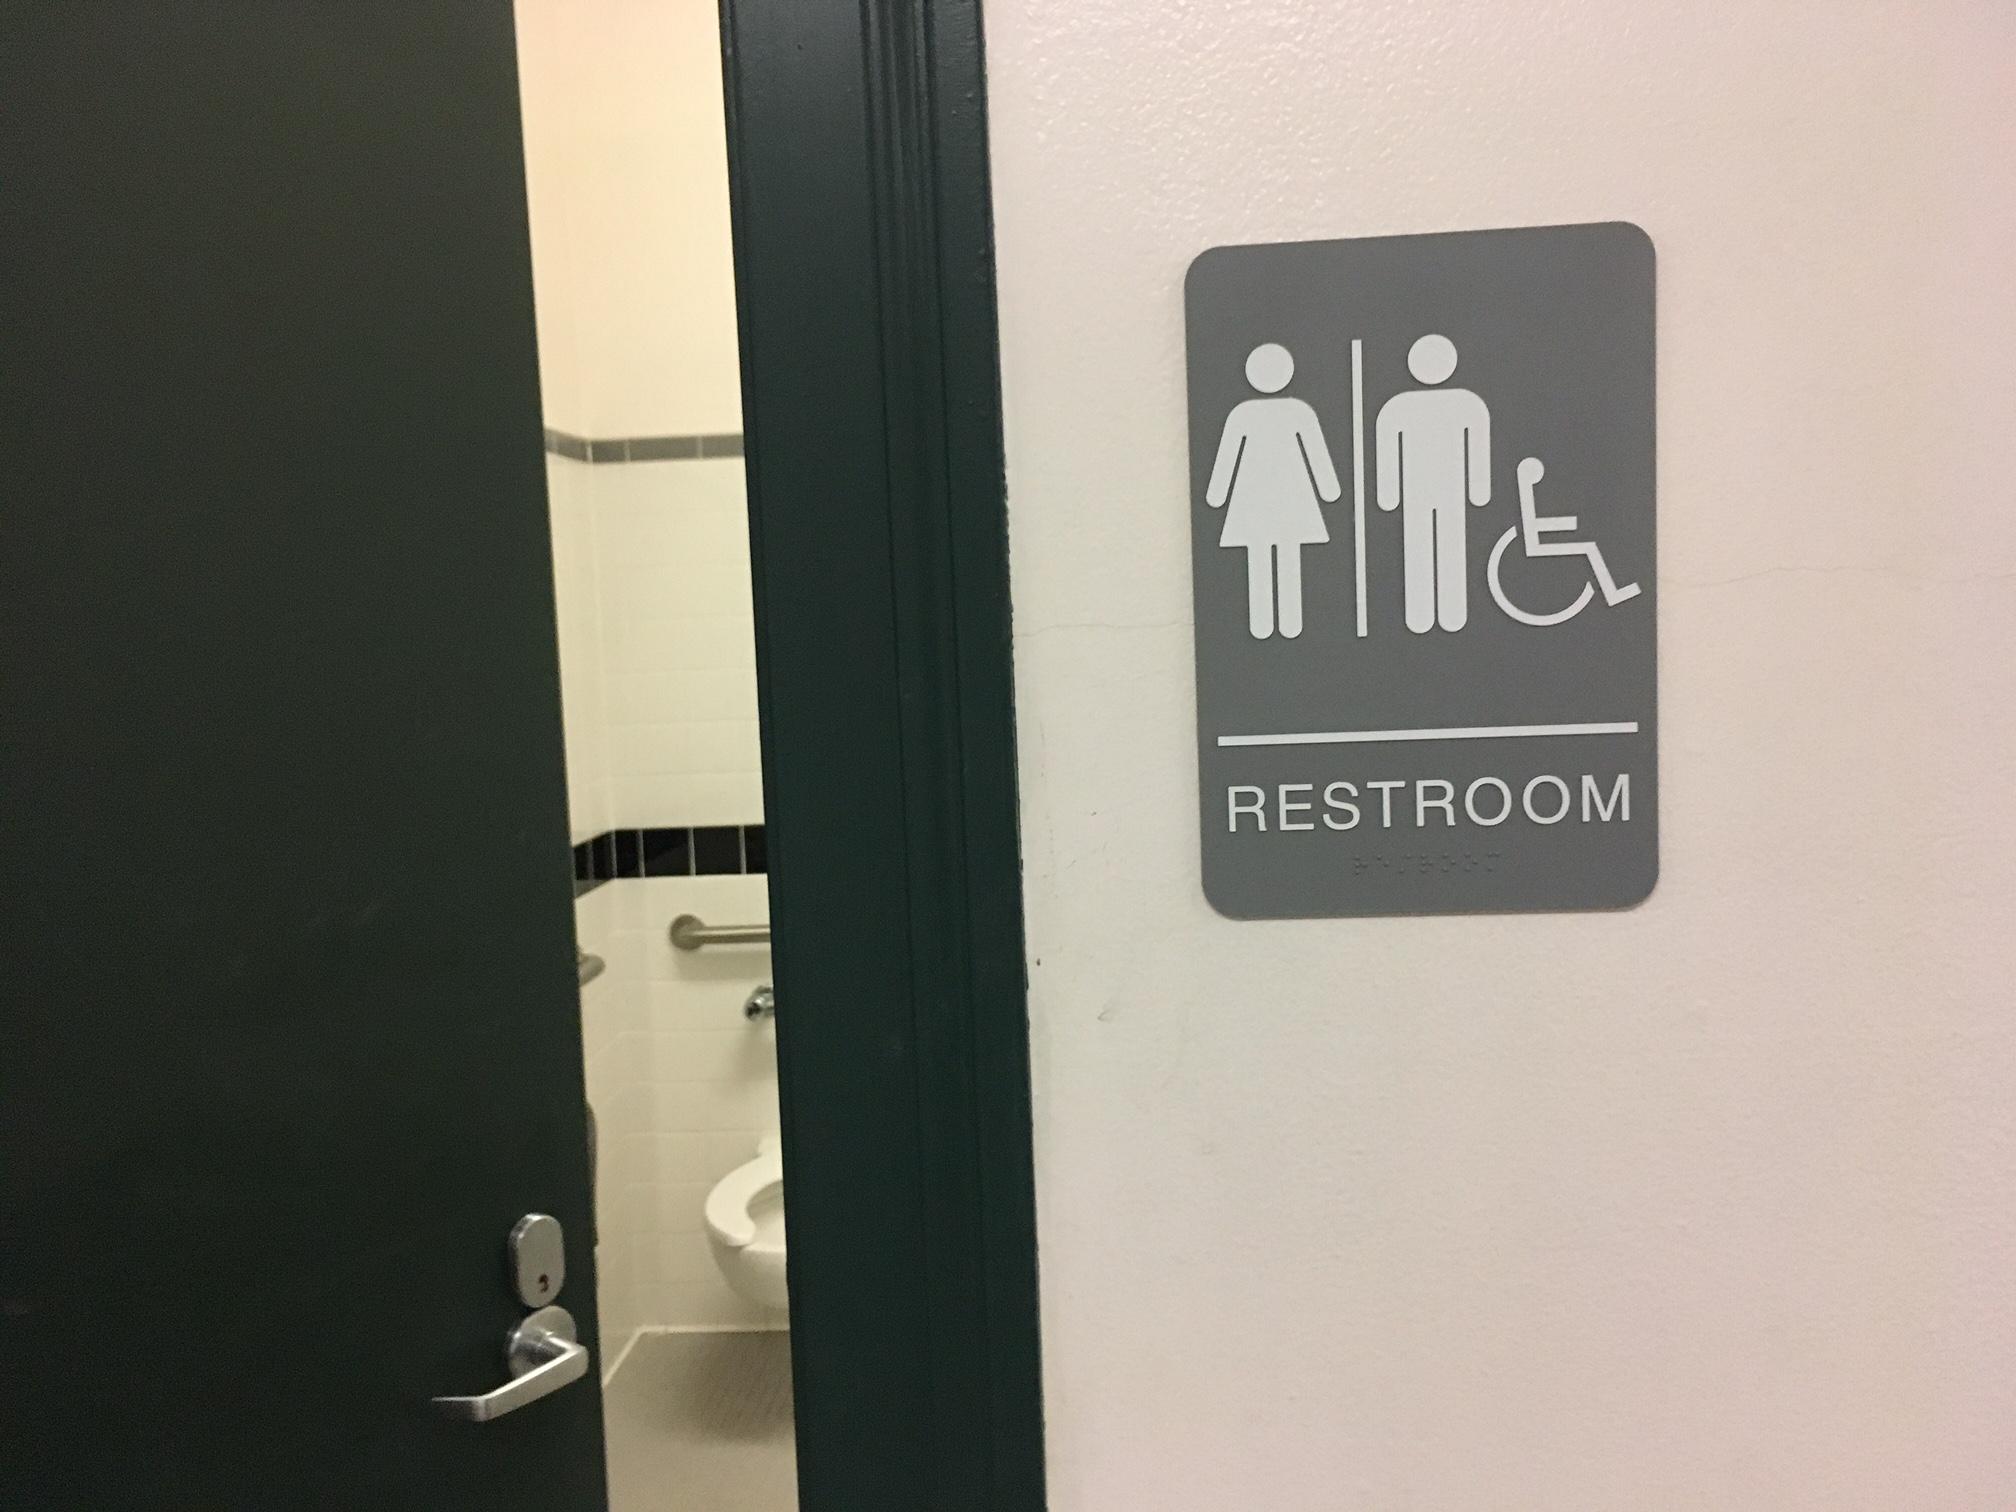 Gender-neutral restroom in City Hall